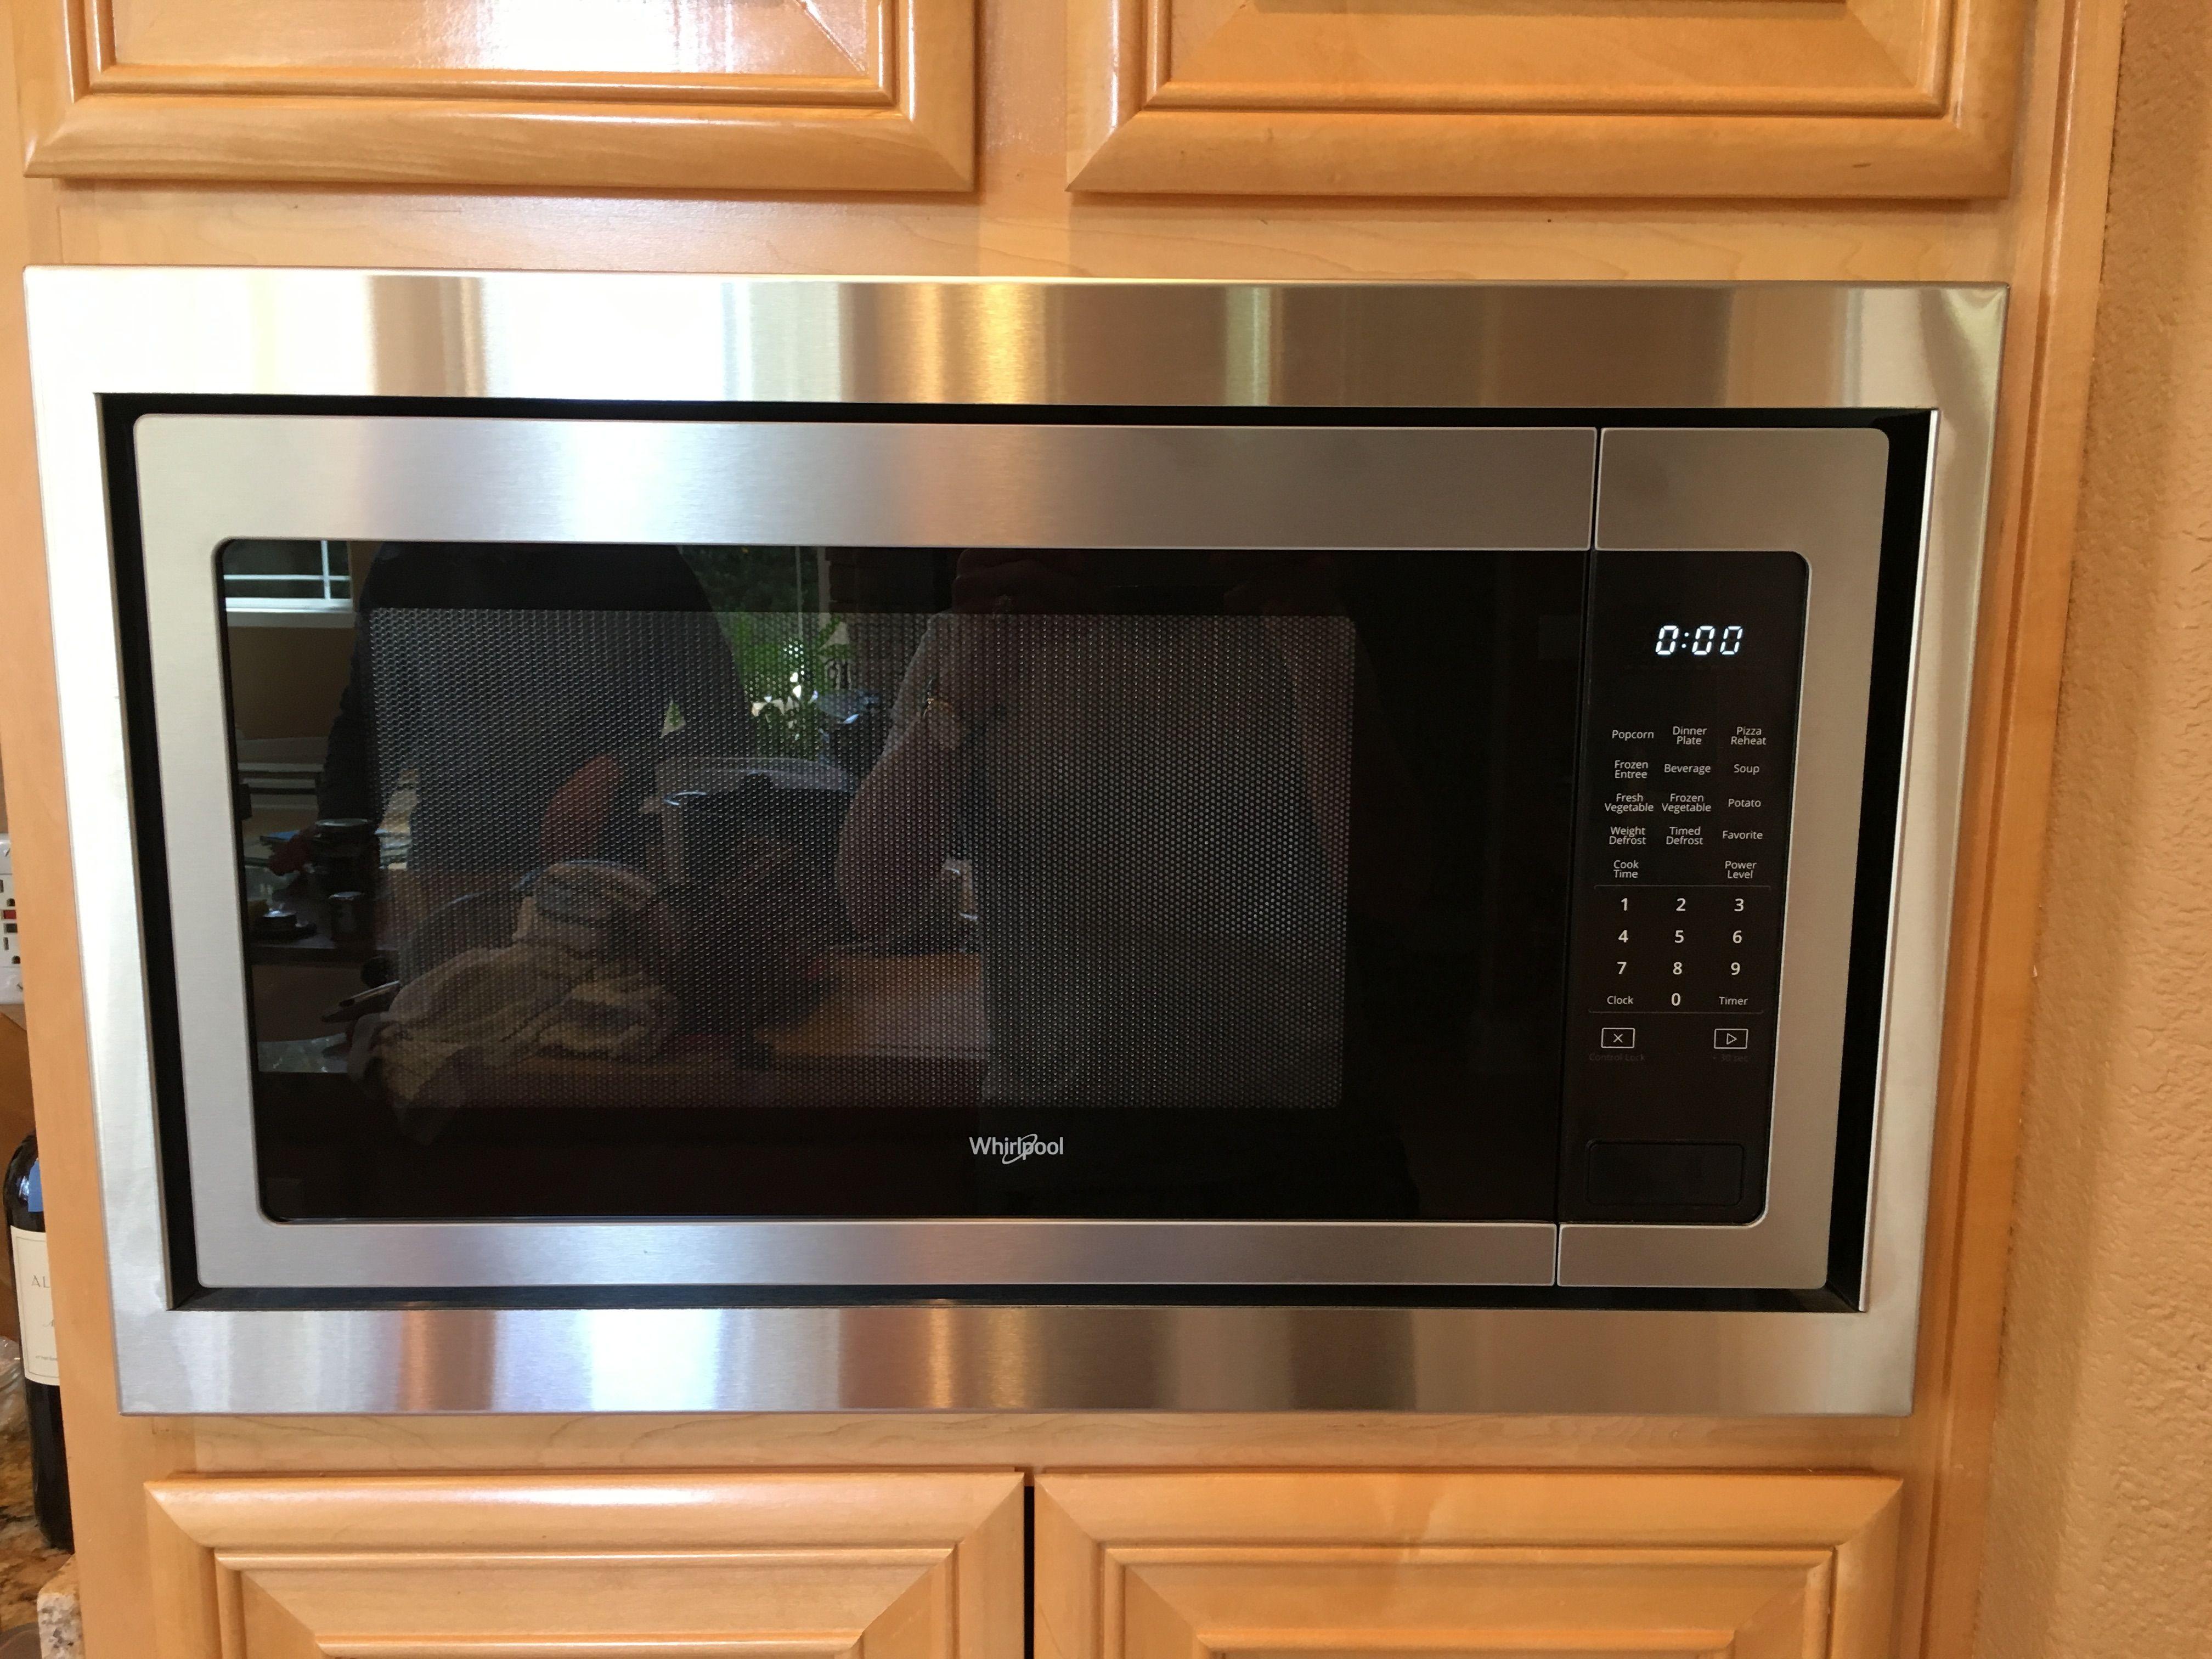 Custom Trim Kit For A Whirlpool Microwave Model Wmc50522hz Microwave Trim Kit Microwave Oven